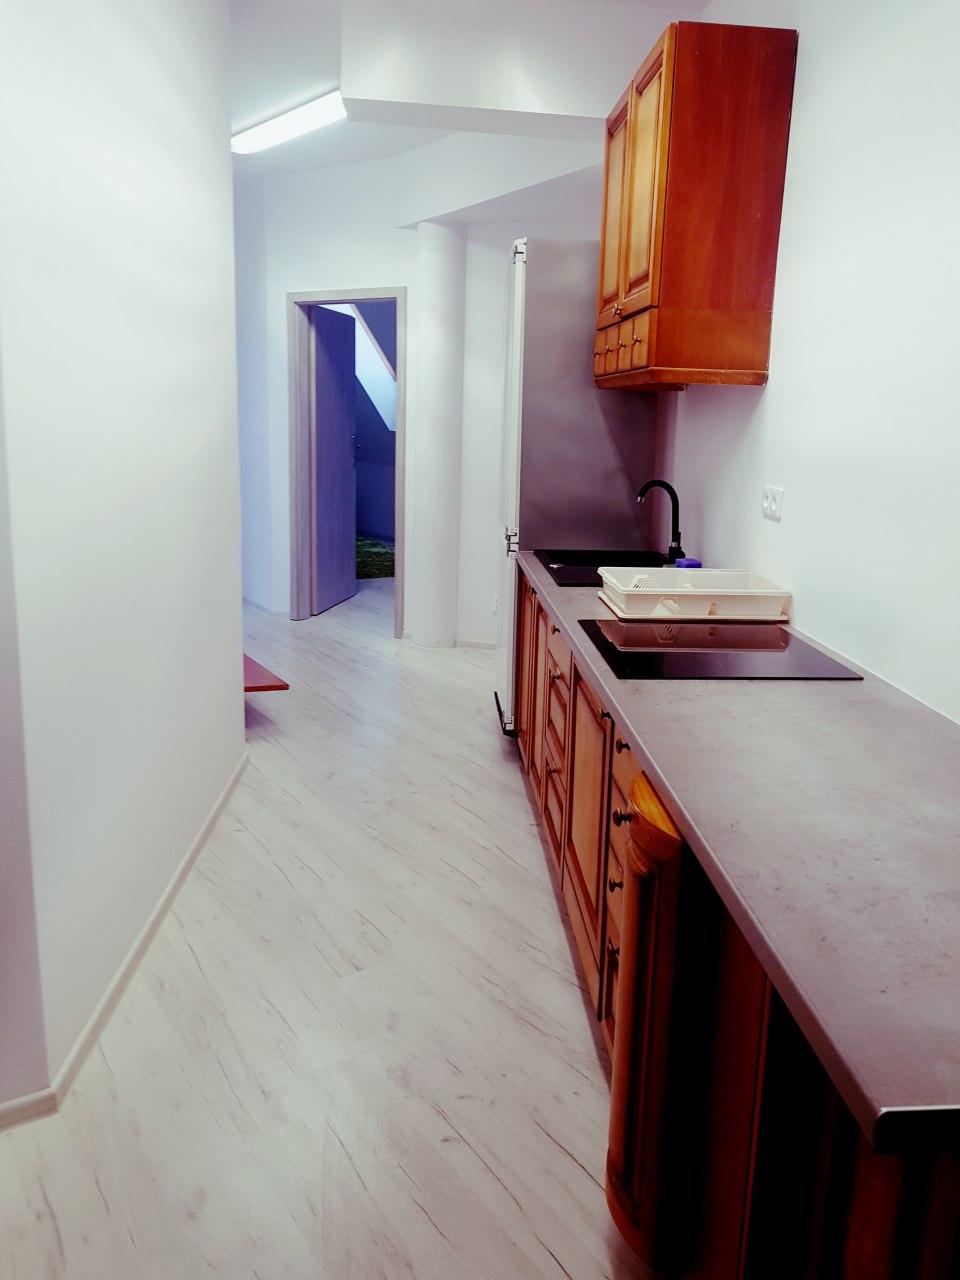 Mieszkanie 3, kuchnia